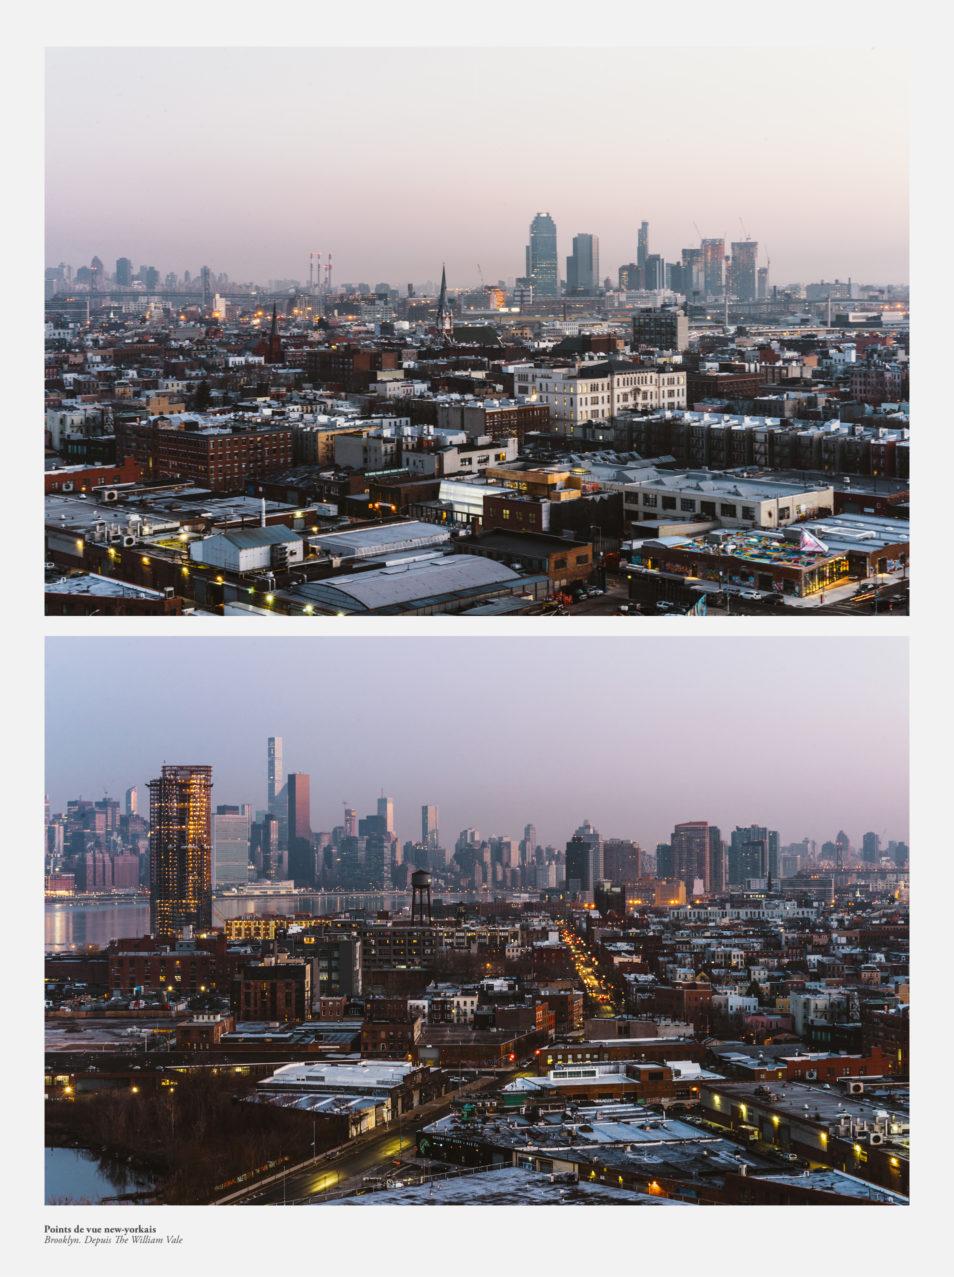 Préparer son voyage à New York Blog Voyage New York